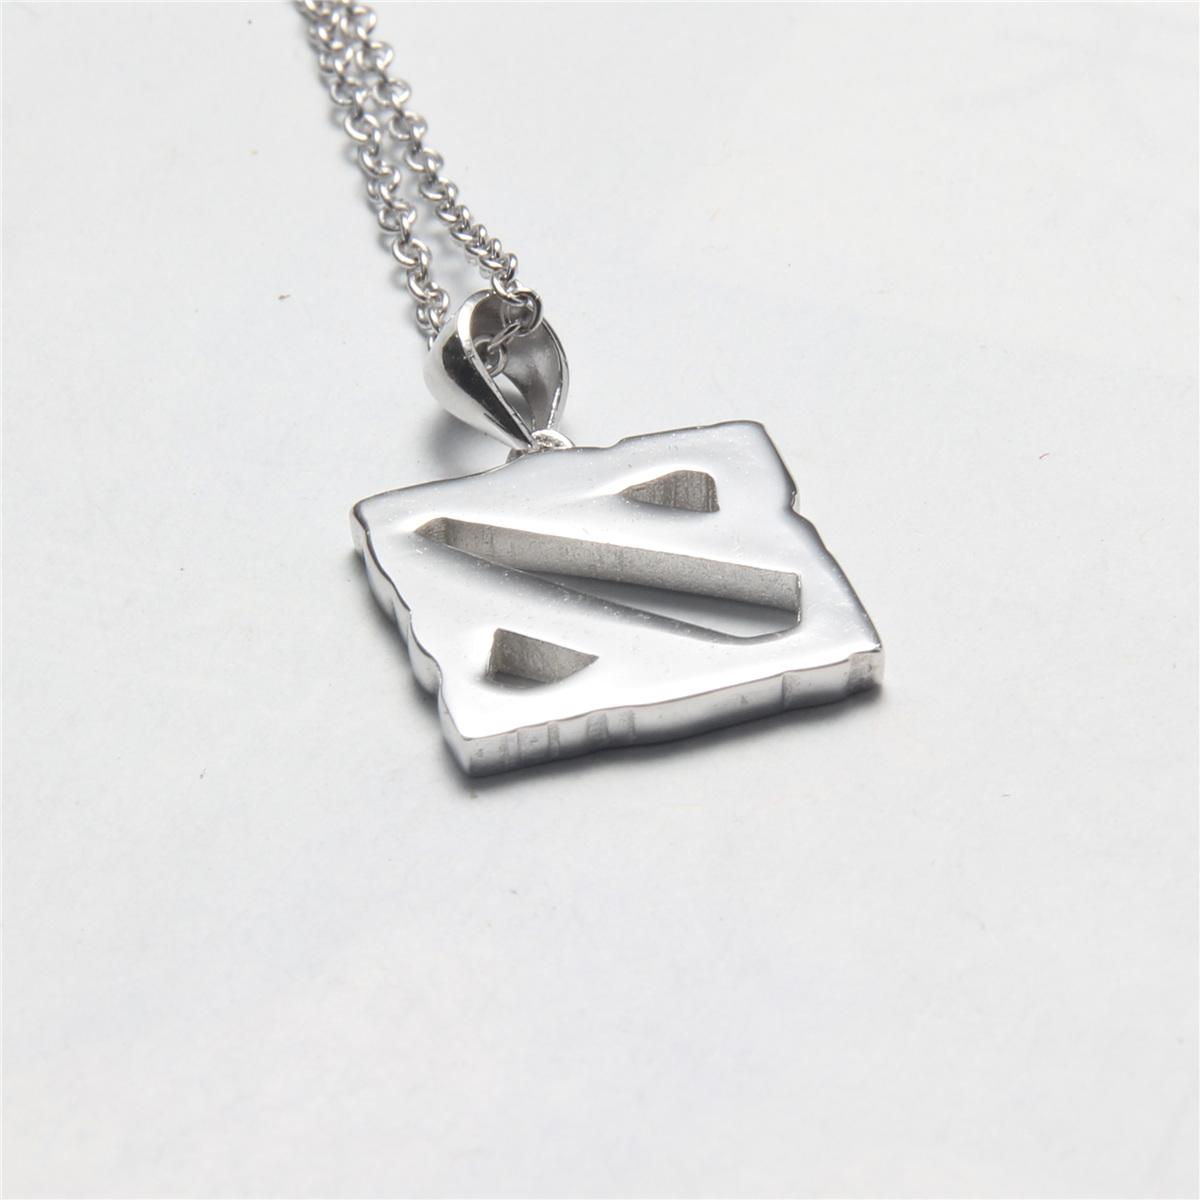 dota2联盟项链标志logo吊坠刀塔挂坠游戏周边饰品周边个性定制